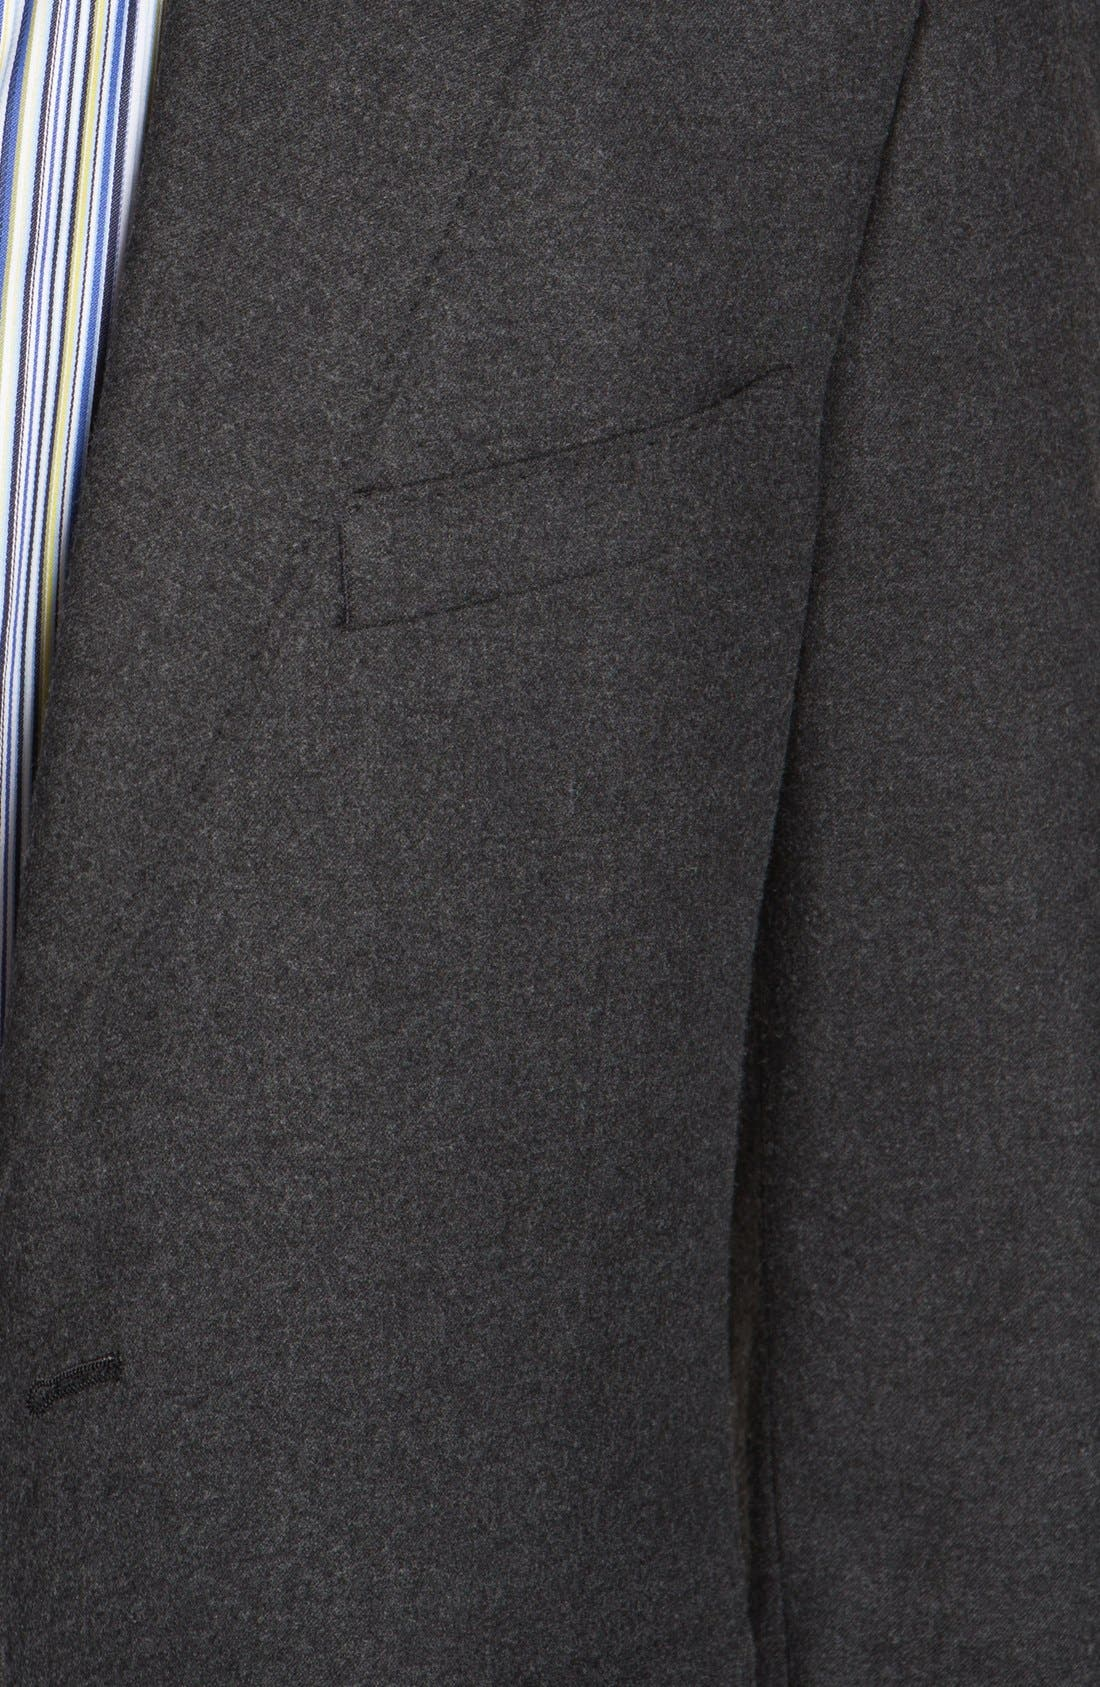 Alternate Image 3  - Kroon 'Cooke' Wool Blend Sportcoat